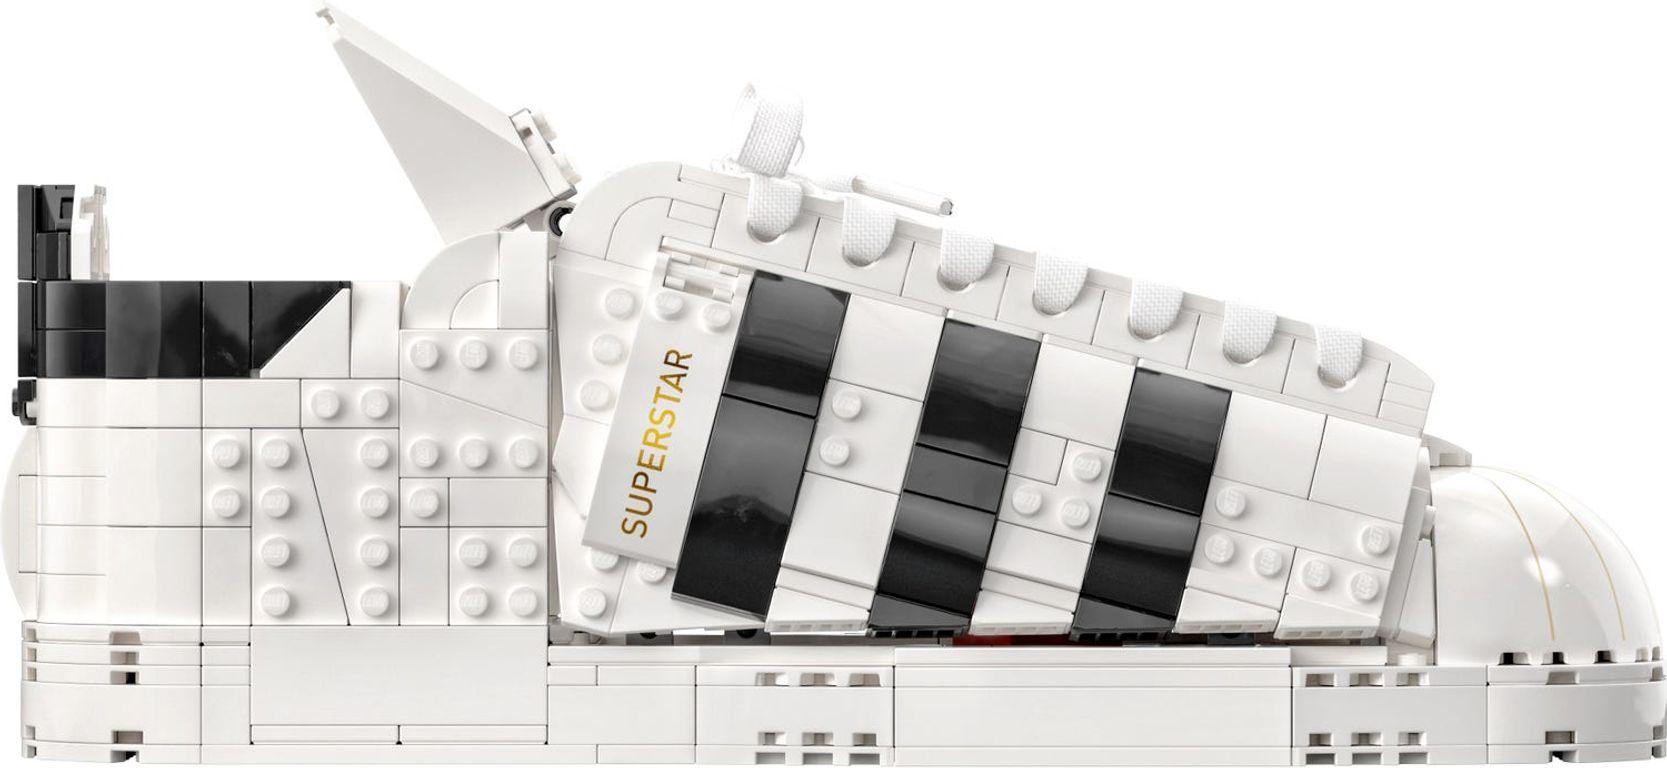 adidas Originals Superstar components